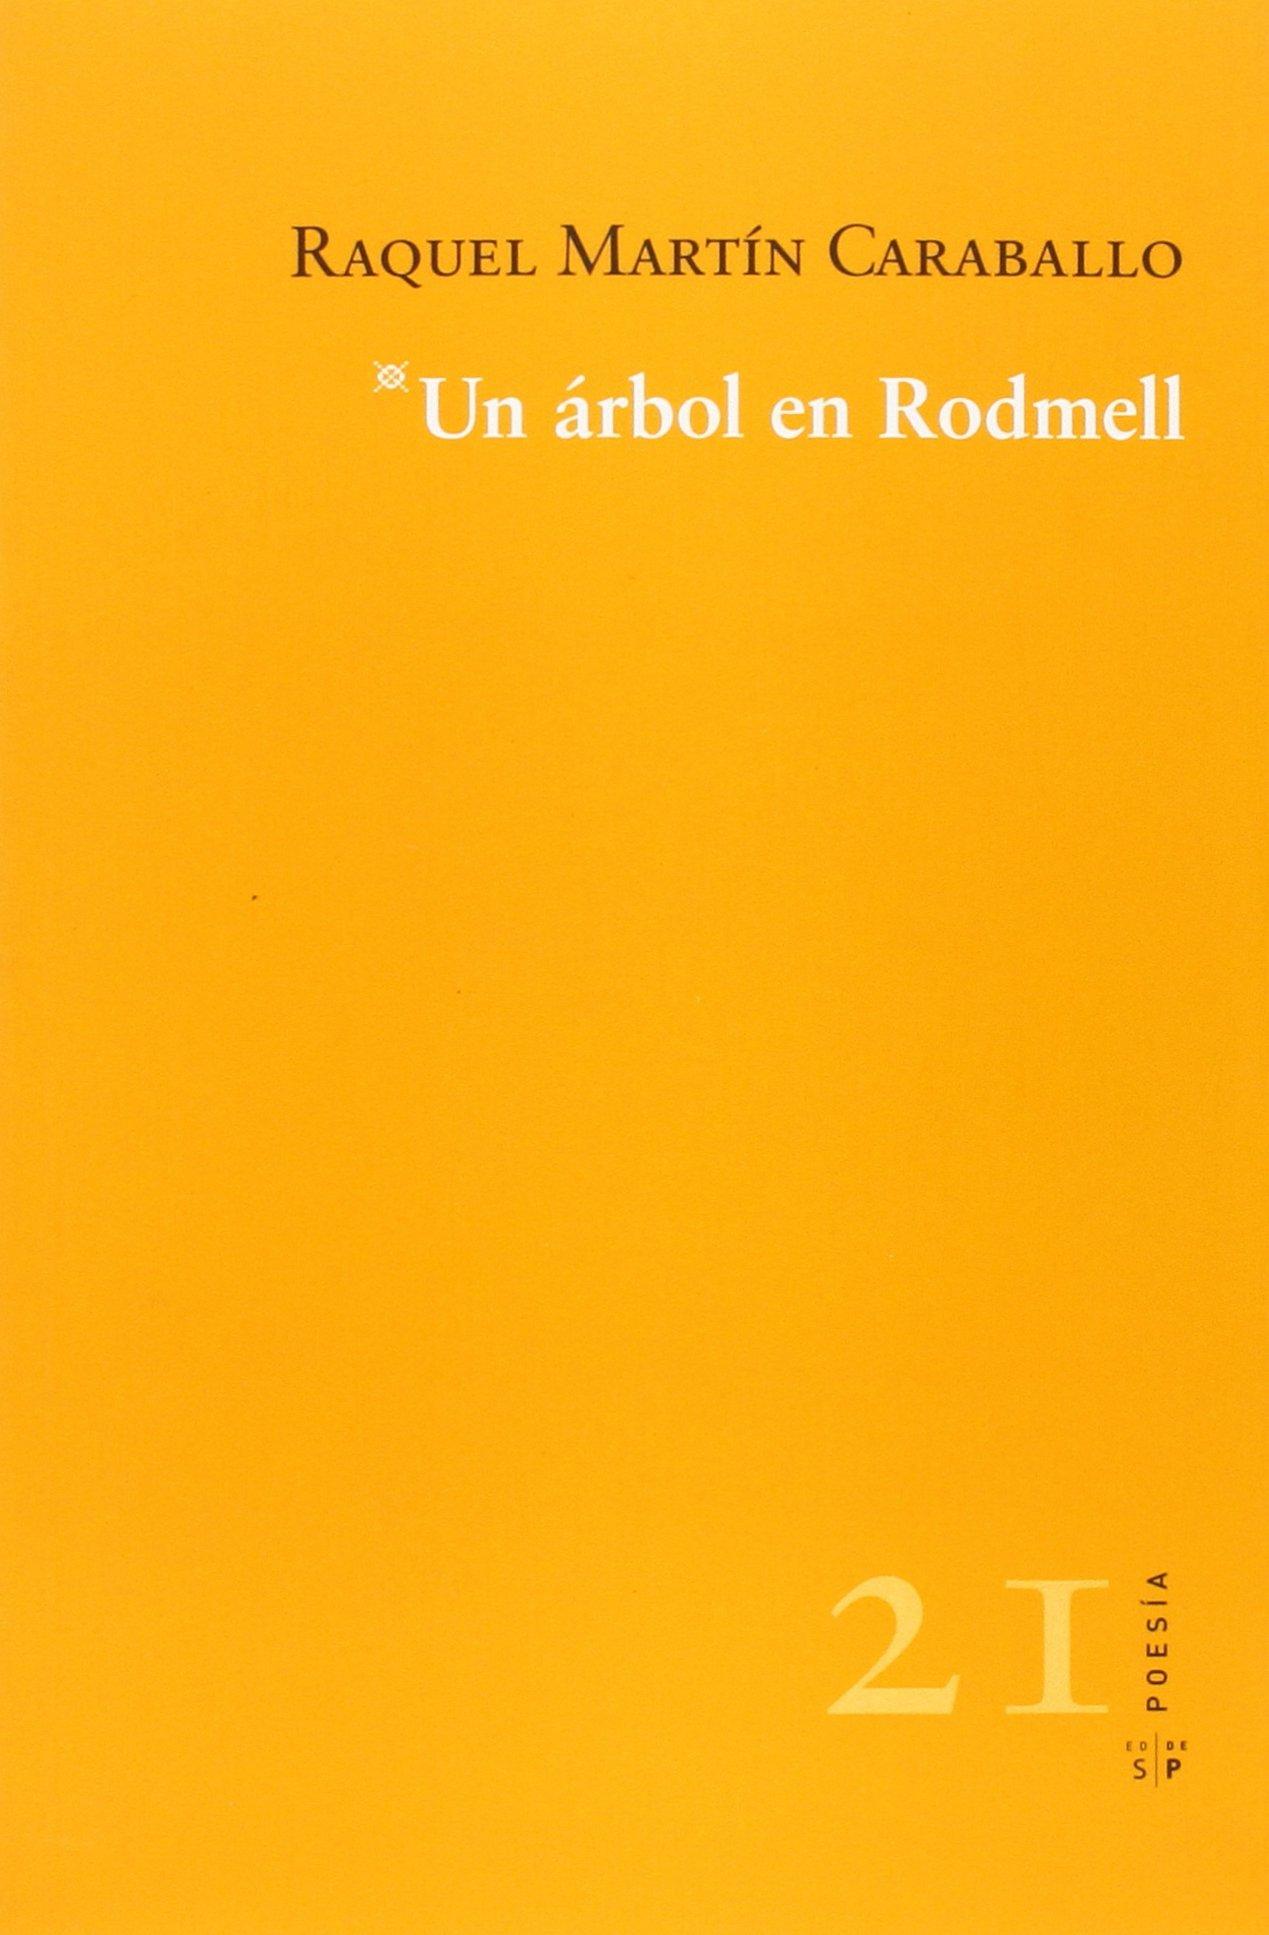 UN ÁRBOL EN RODMELL (Poesia (salto De Pagina)): Amazon.es: RAQUEL MARTÍN CARABALLO: Libros